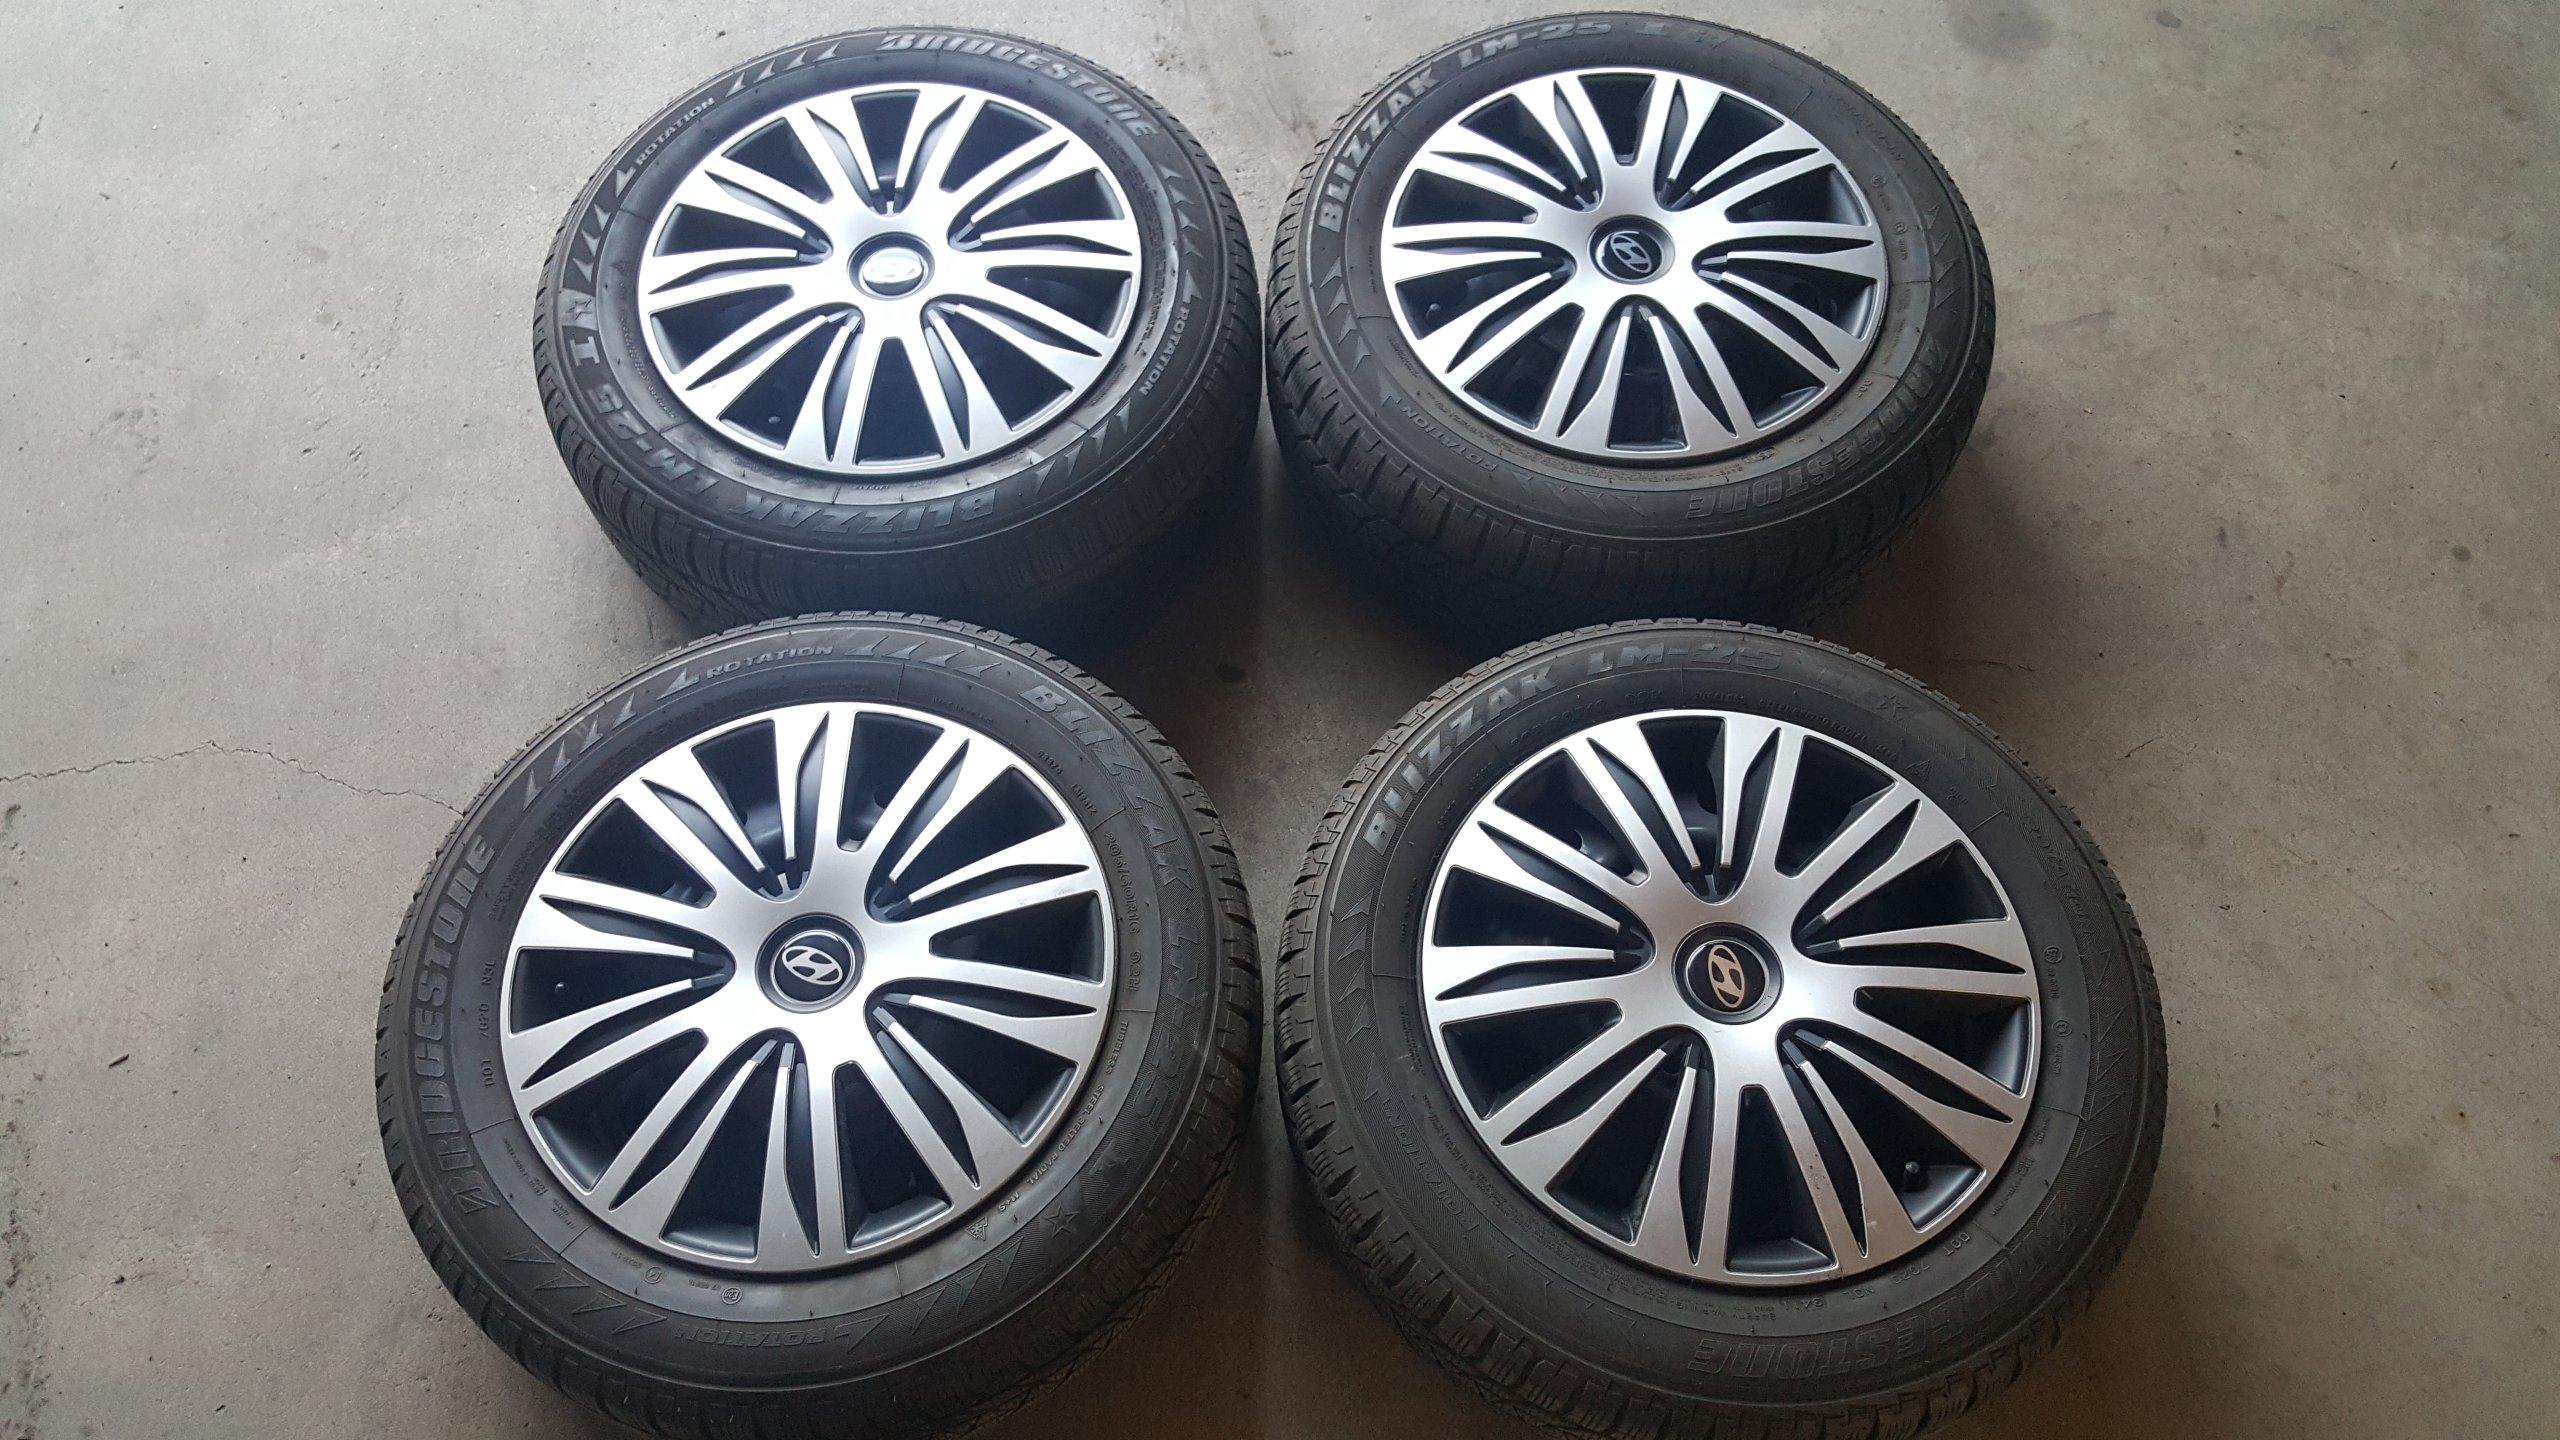 Felgi Opony Zimowe 20560 R16 Bridgestone Blizzak 7057006817